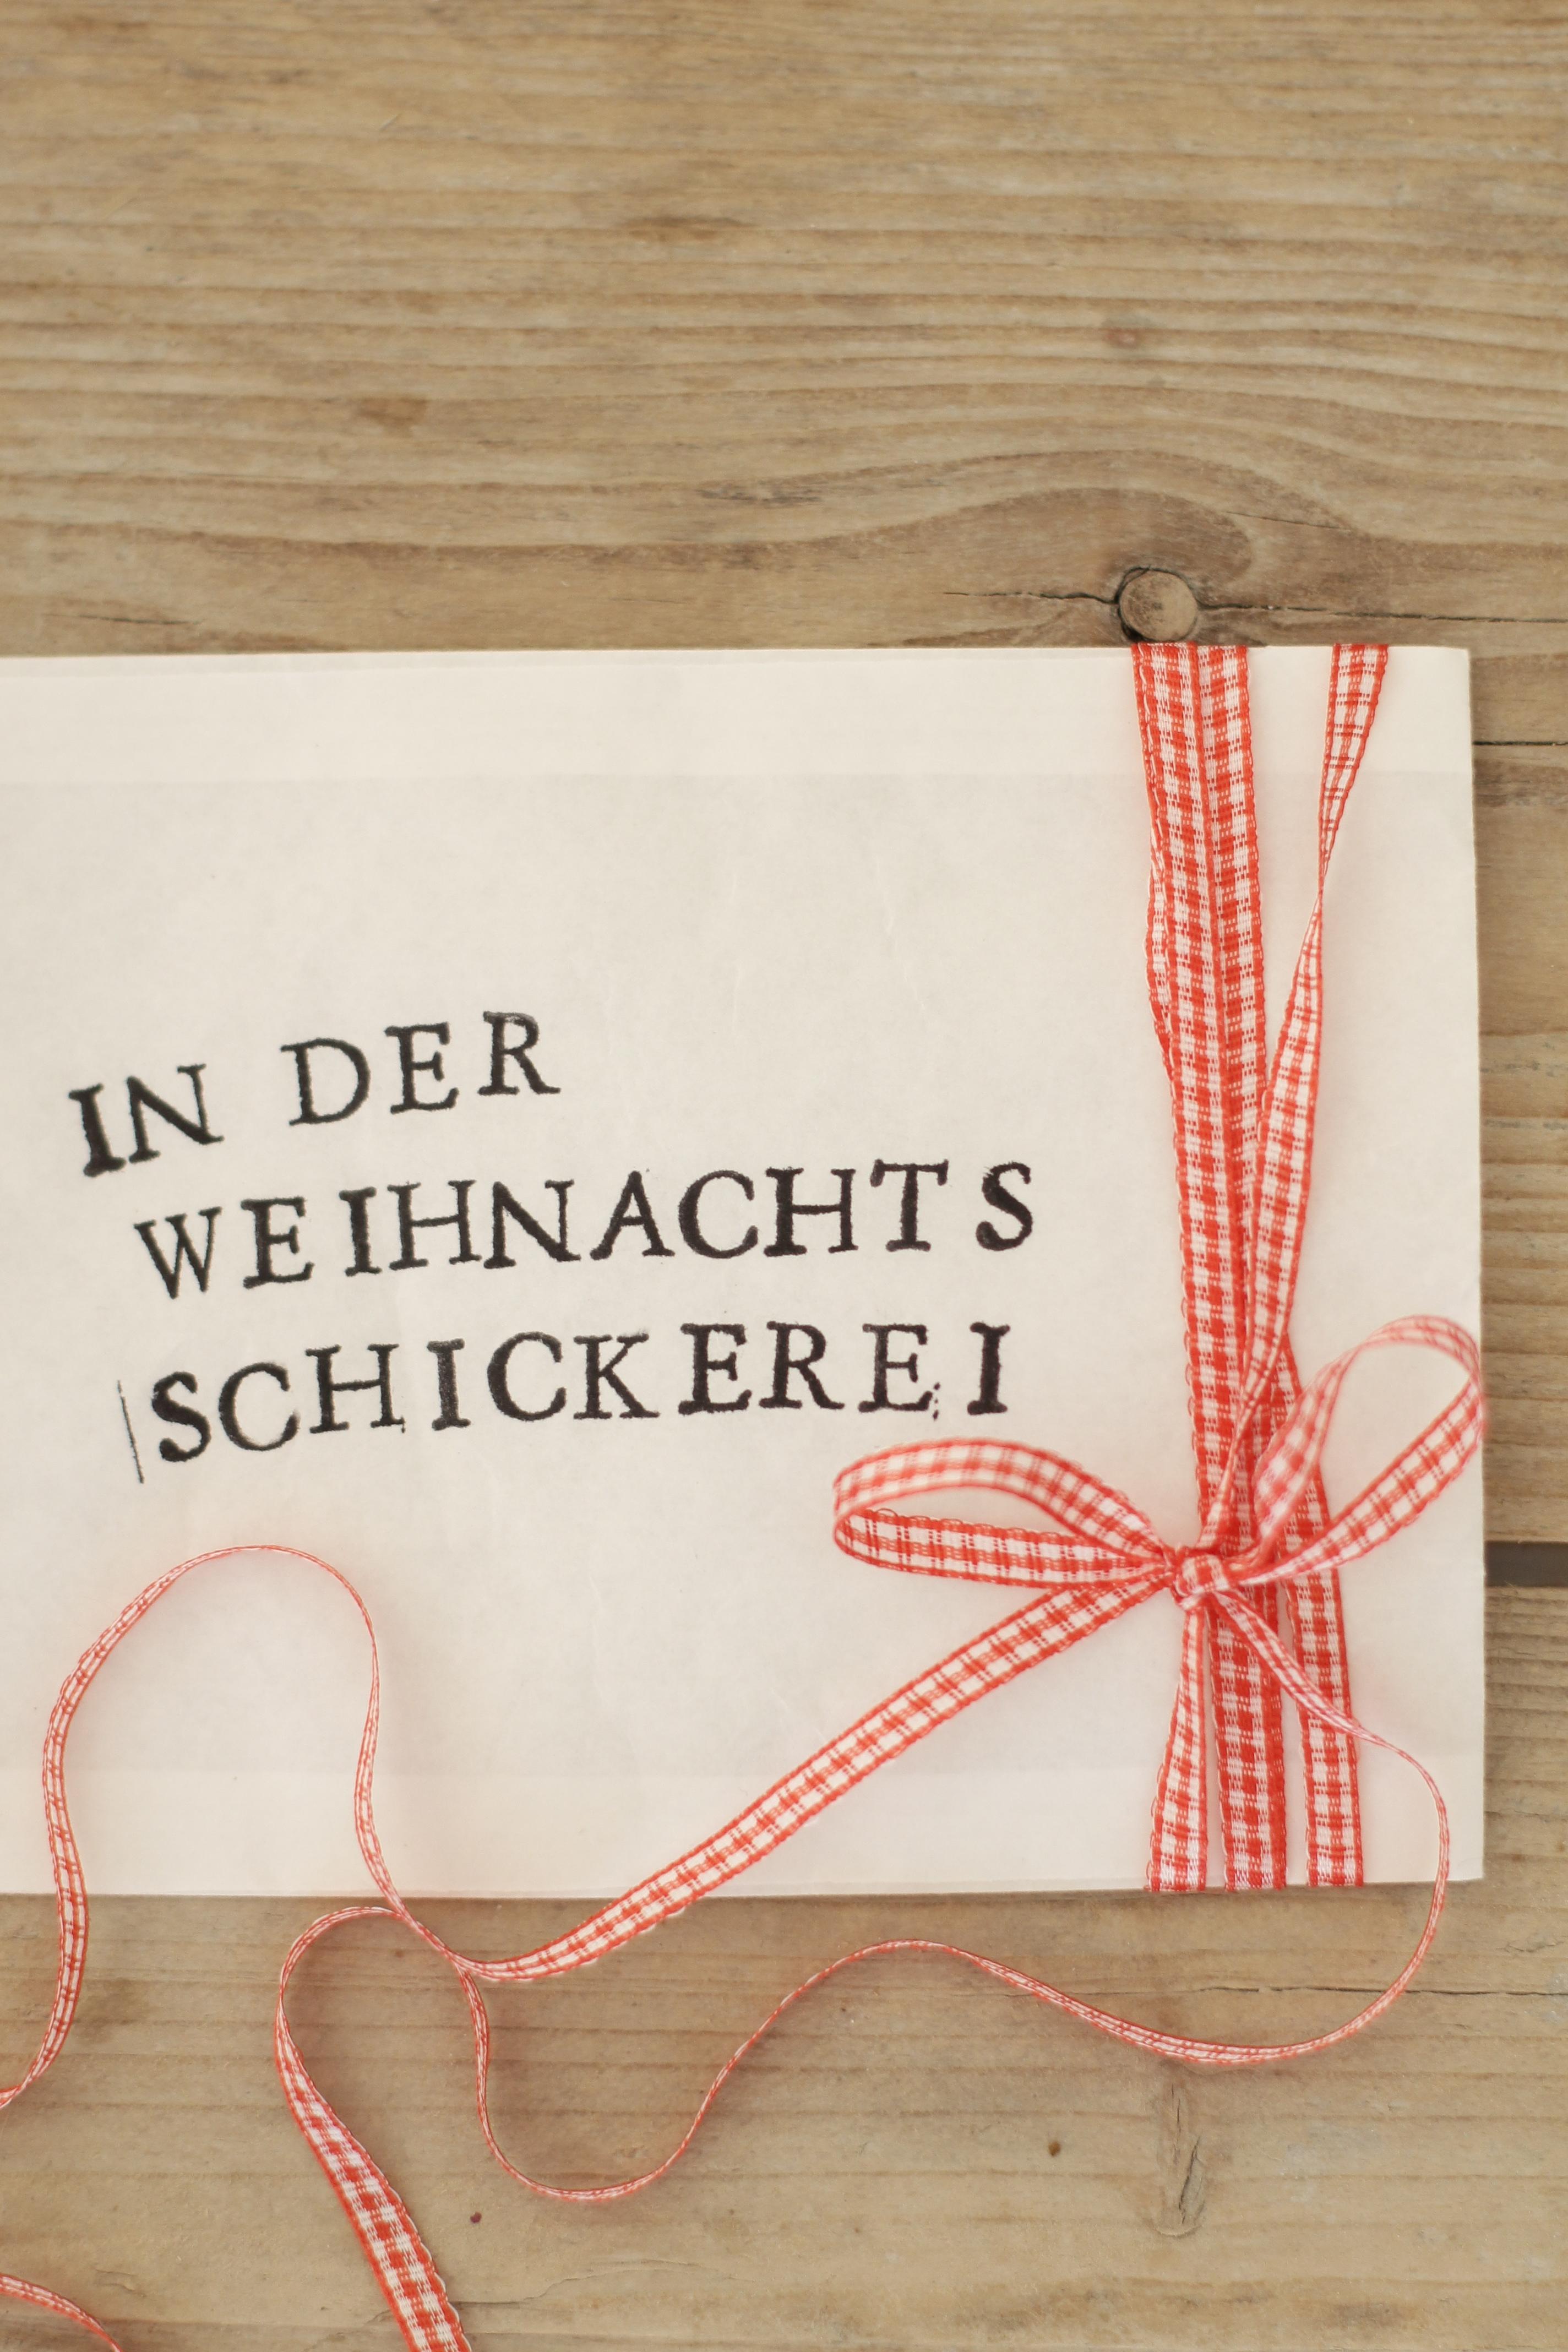 http://www.postausmeinerkueche.de/wp-content/uploads/2012/10/IMG_1554.jpg